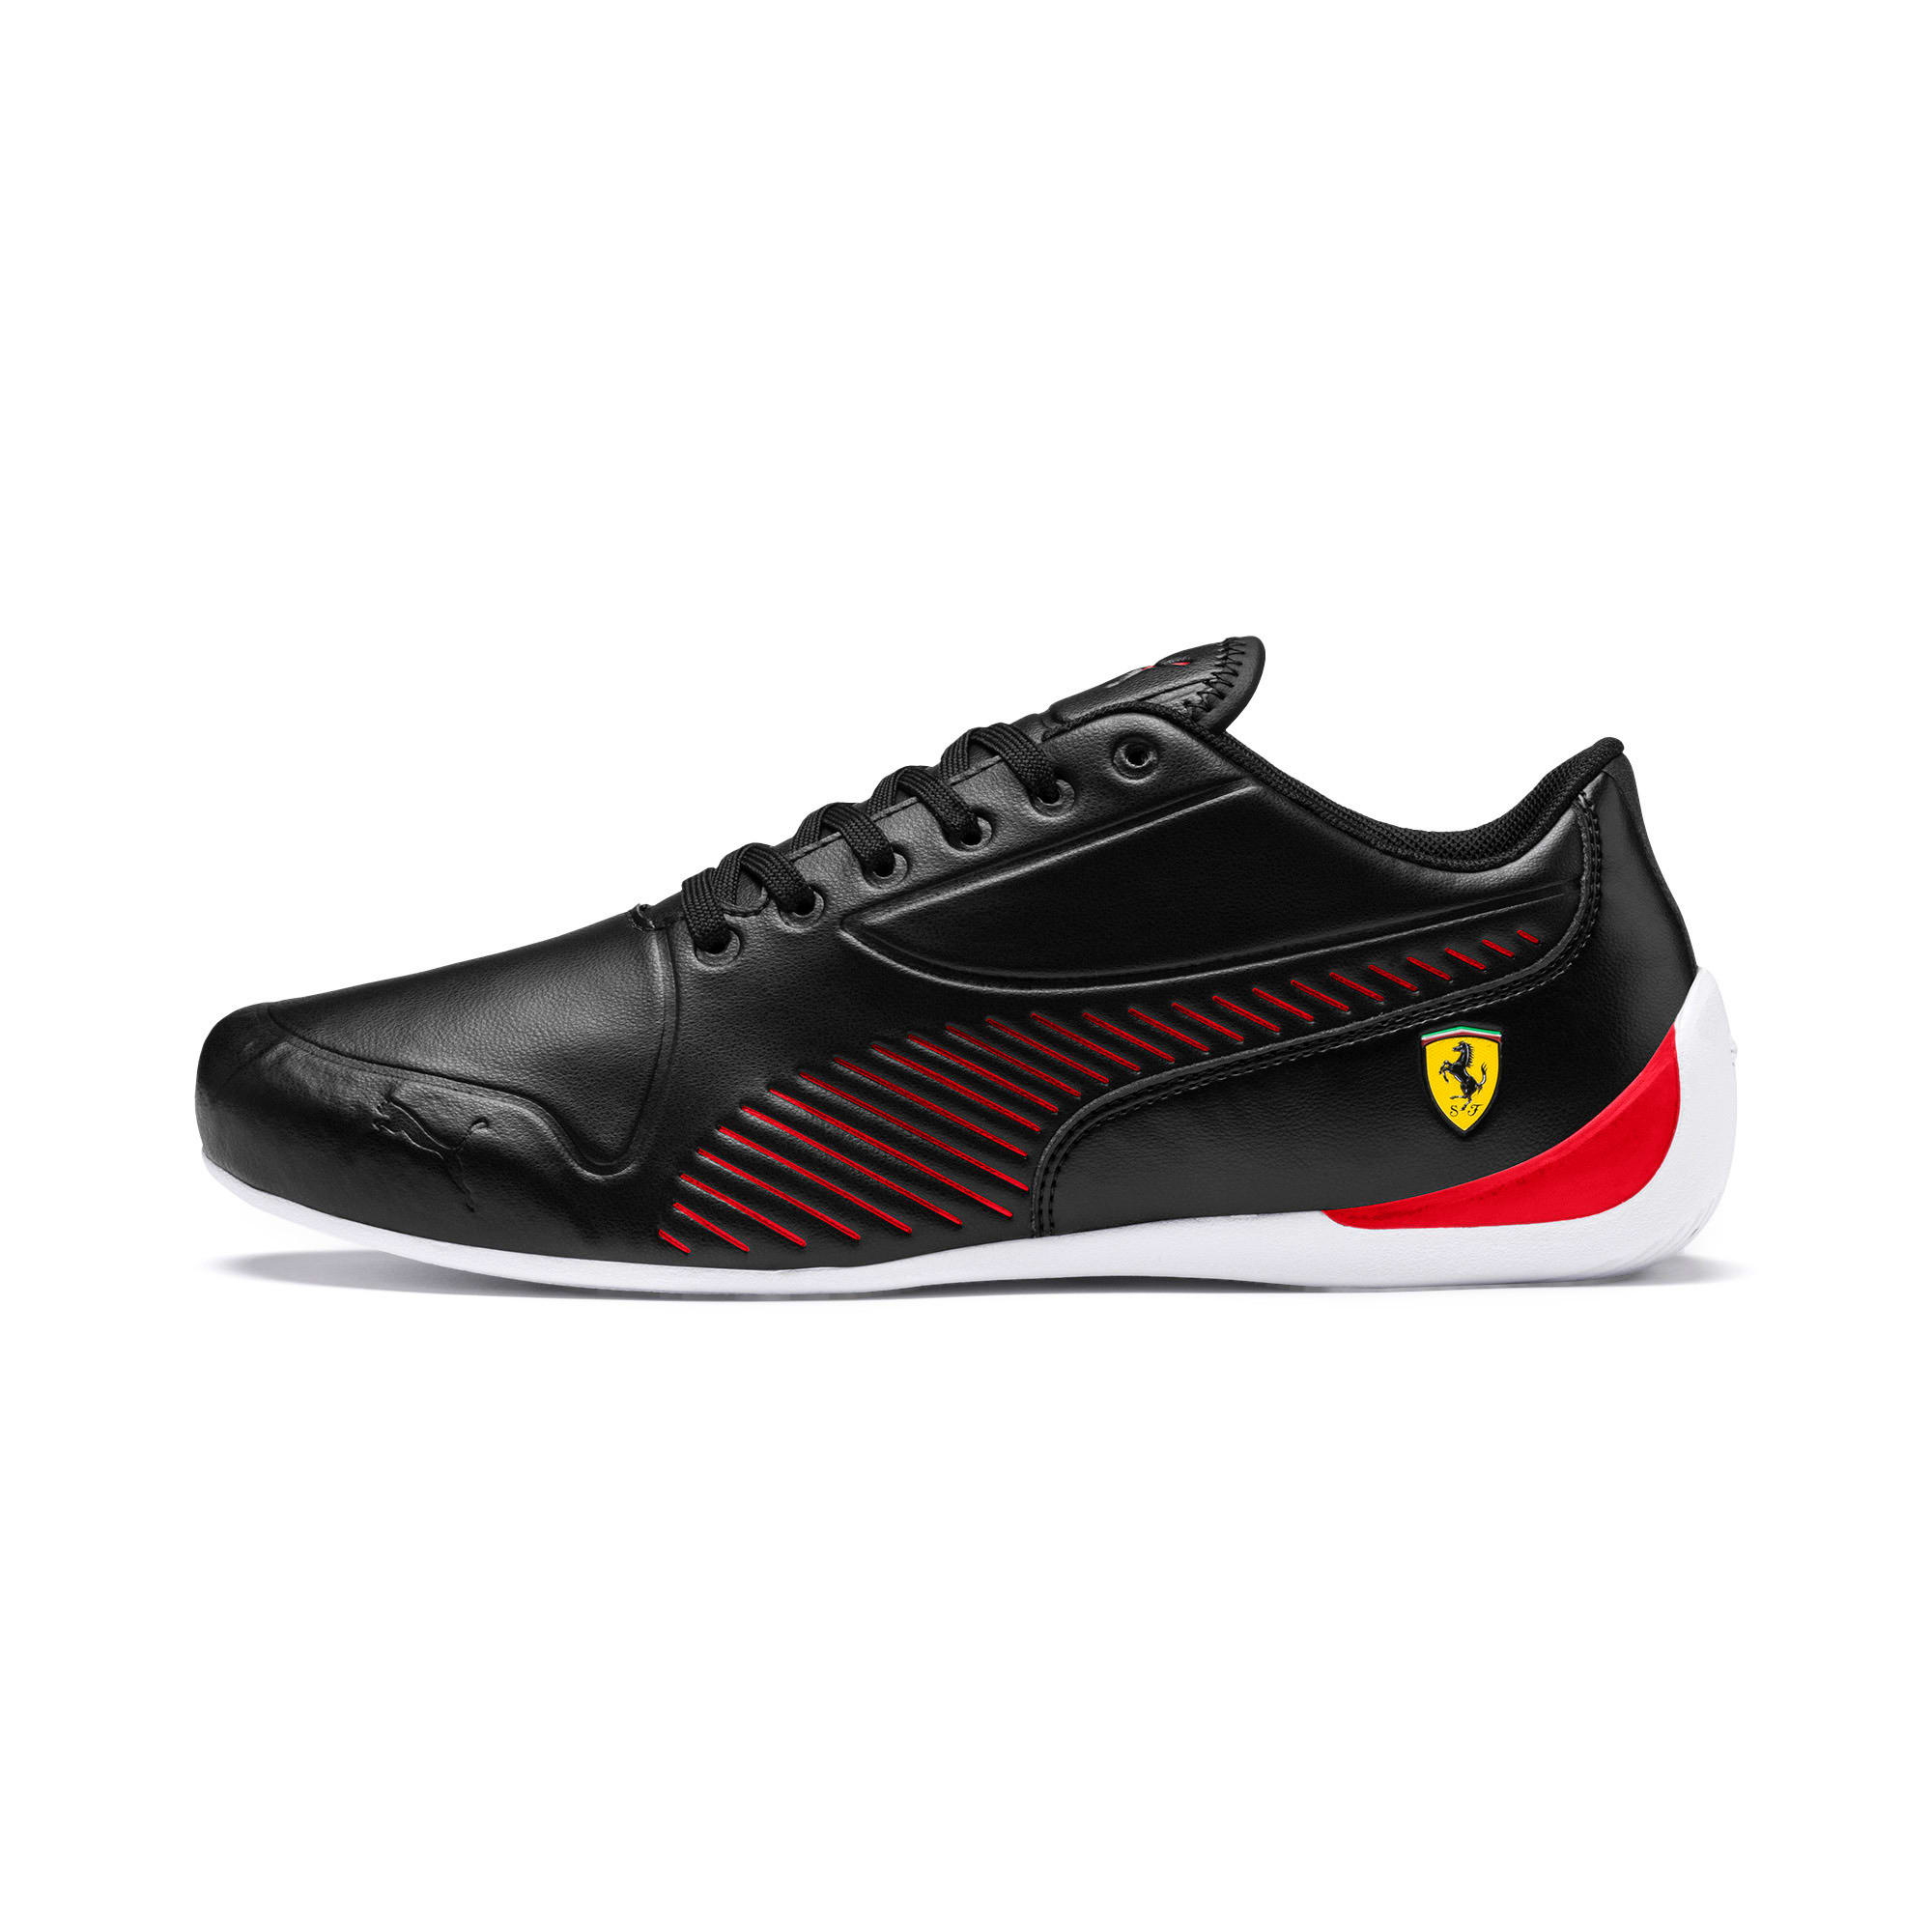 Thumbnail 1 of Scuderia Ferrari Drift Cat 7S Ultra Men's Shoes, Puma Black-Rosso Corsa, medium